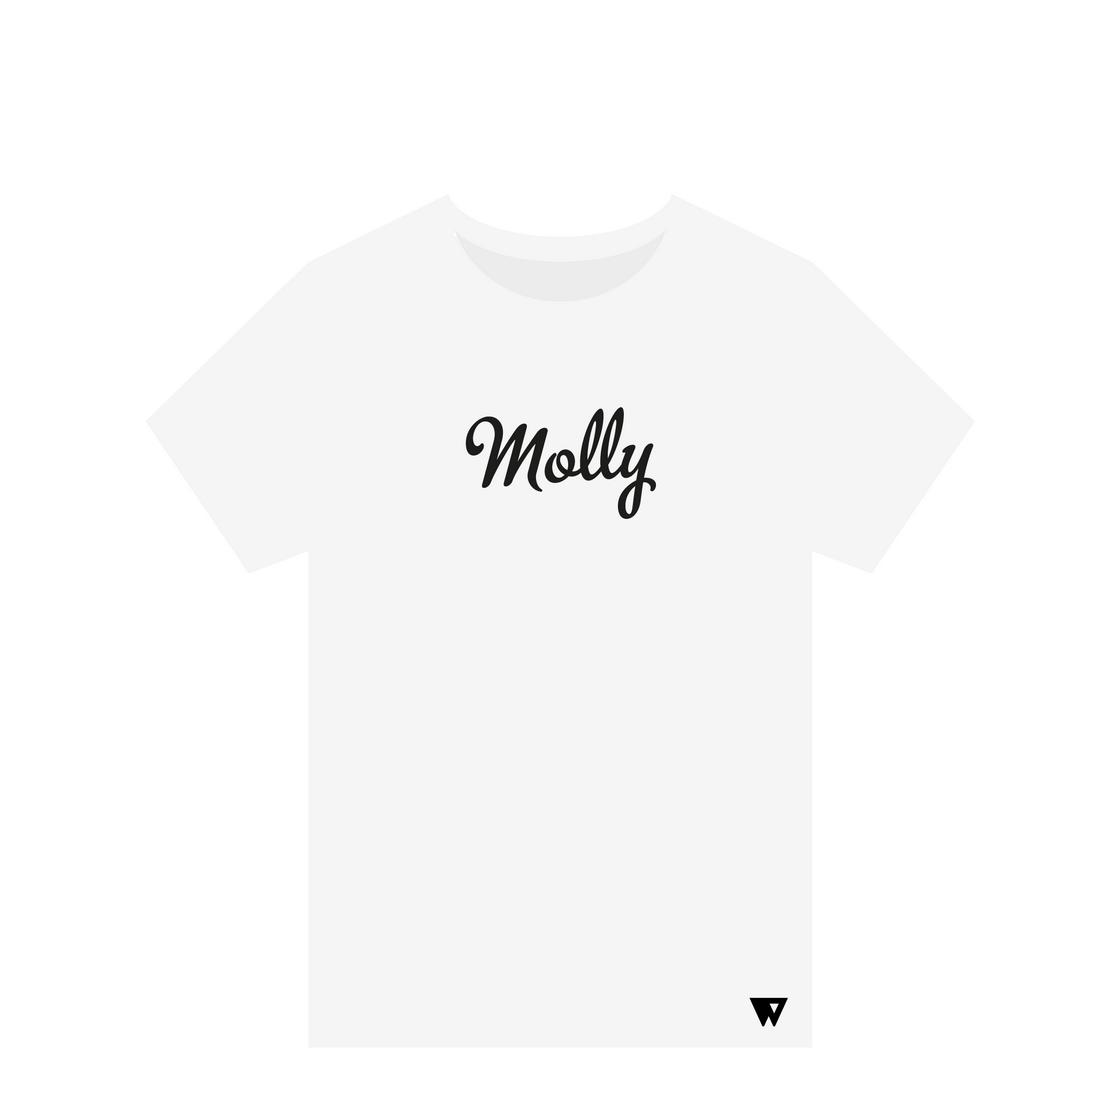 T-Shirt Molly | Wuzzee